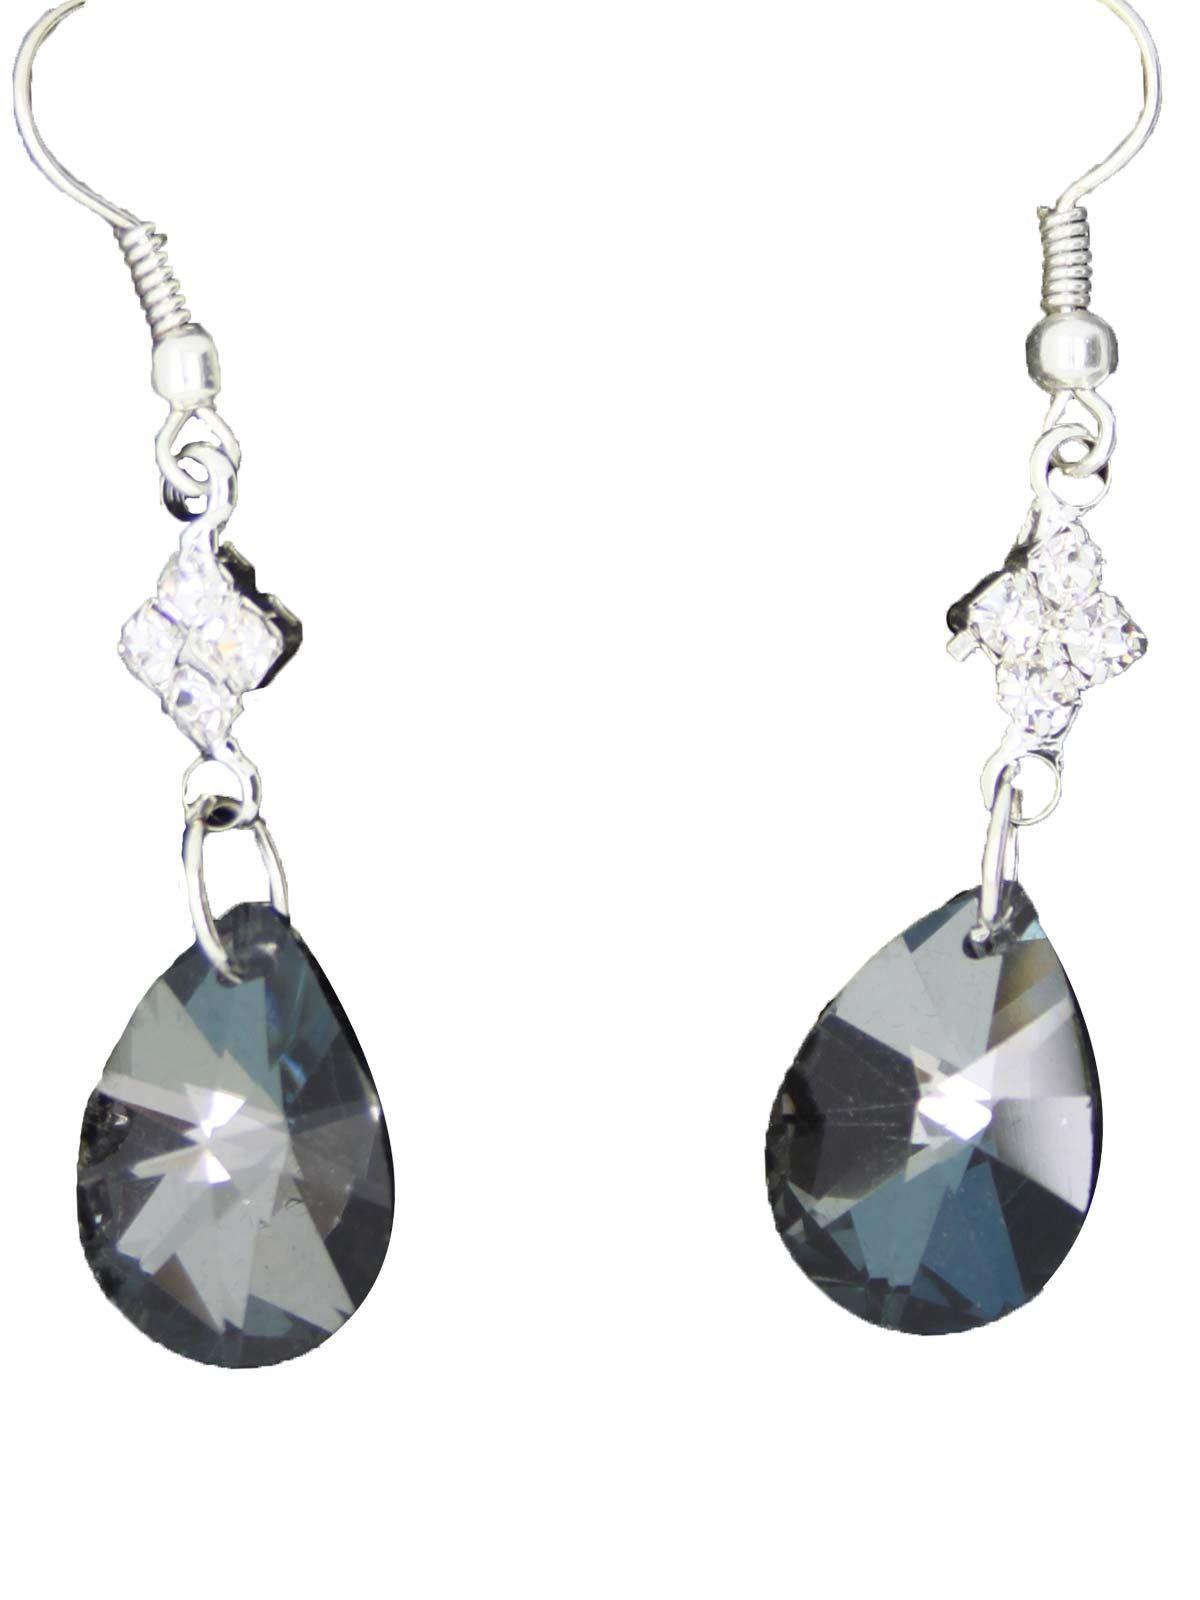 True-Face-Ladies-Women-039-s-Elegant-Earrings-Necklace-Set-Metal-Alloy-Jewellery thumbnail 44